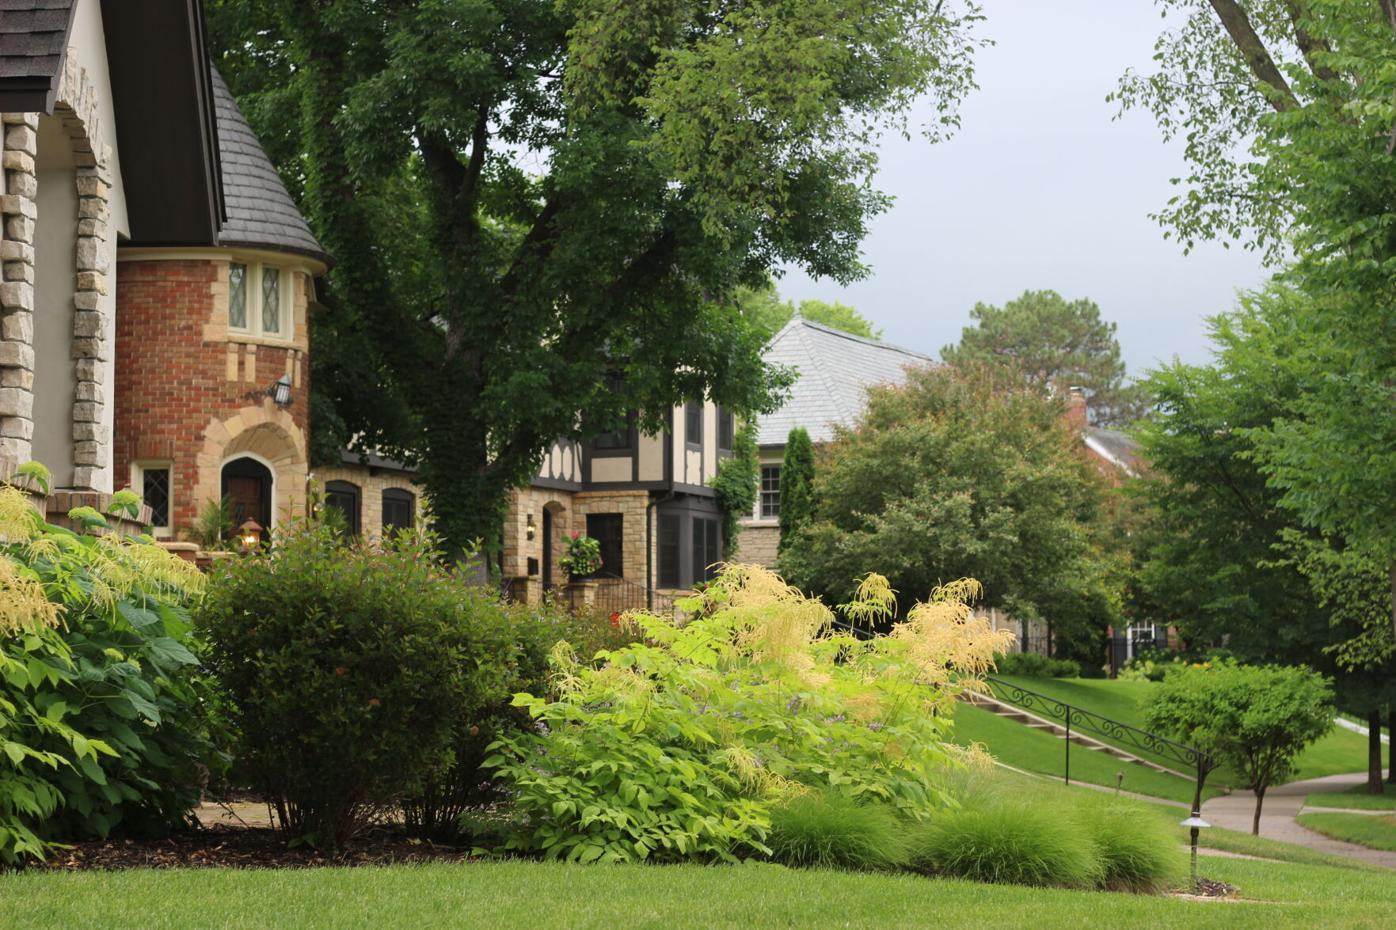 Country Club neighborhood